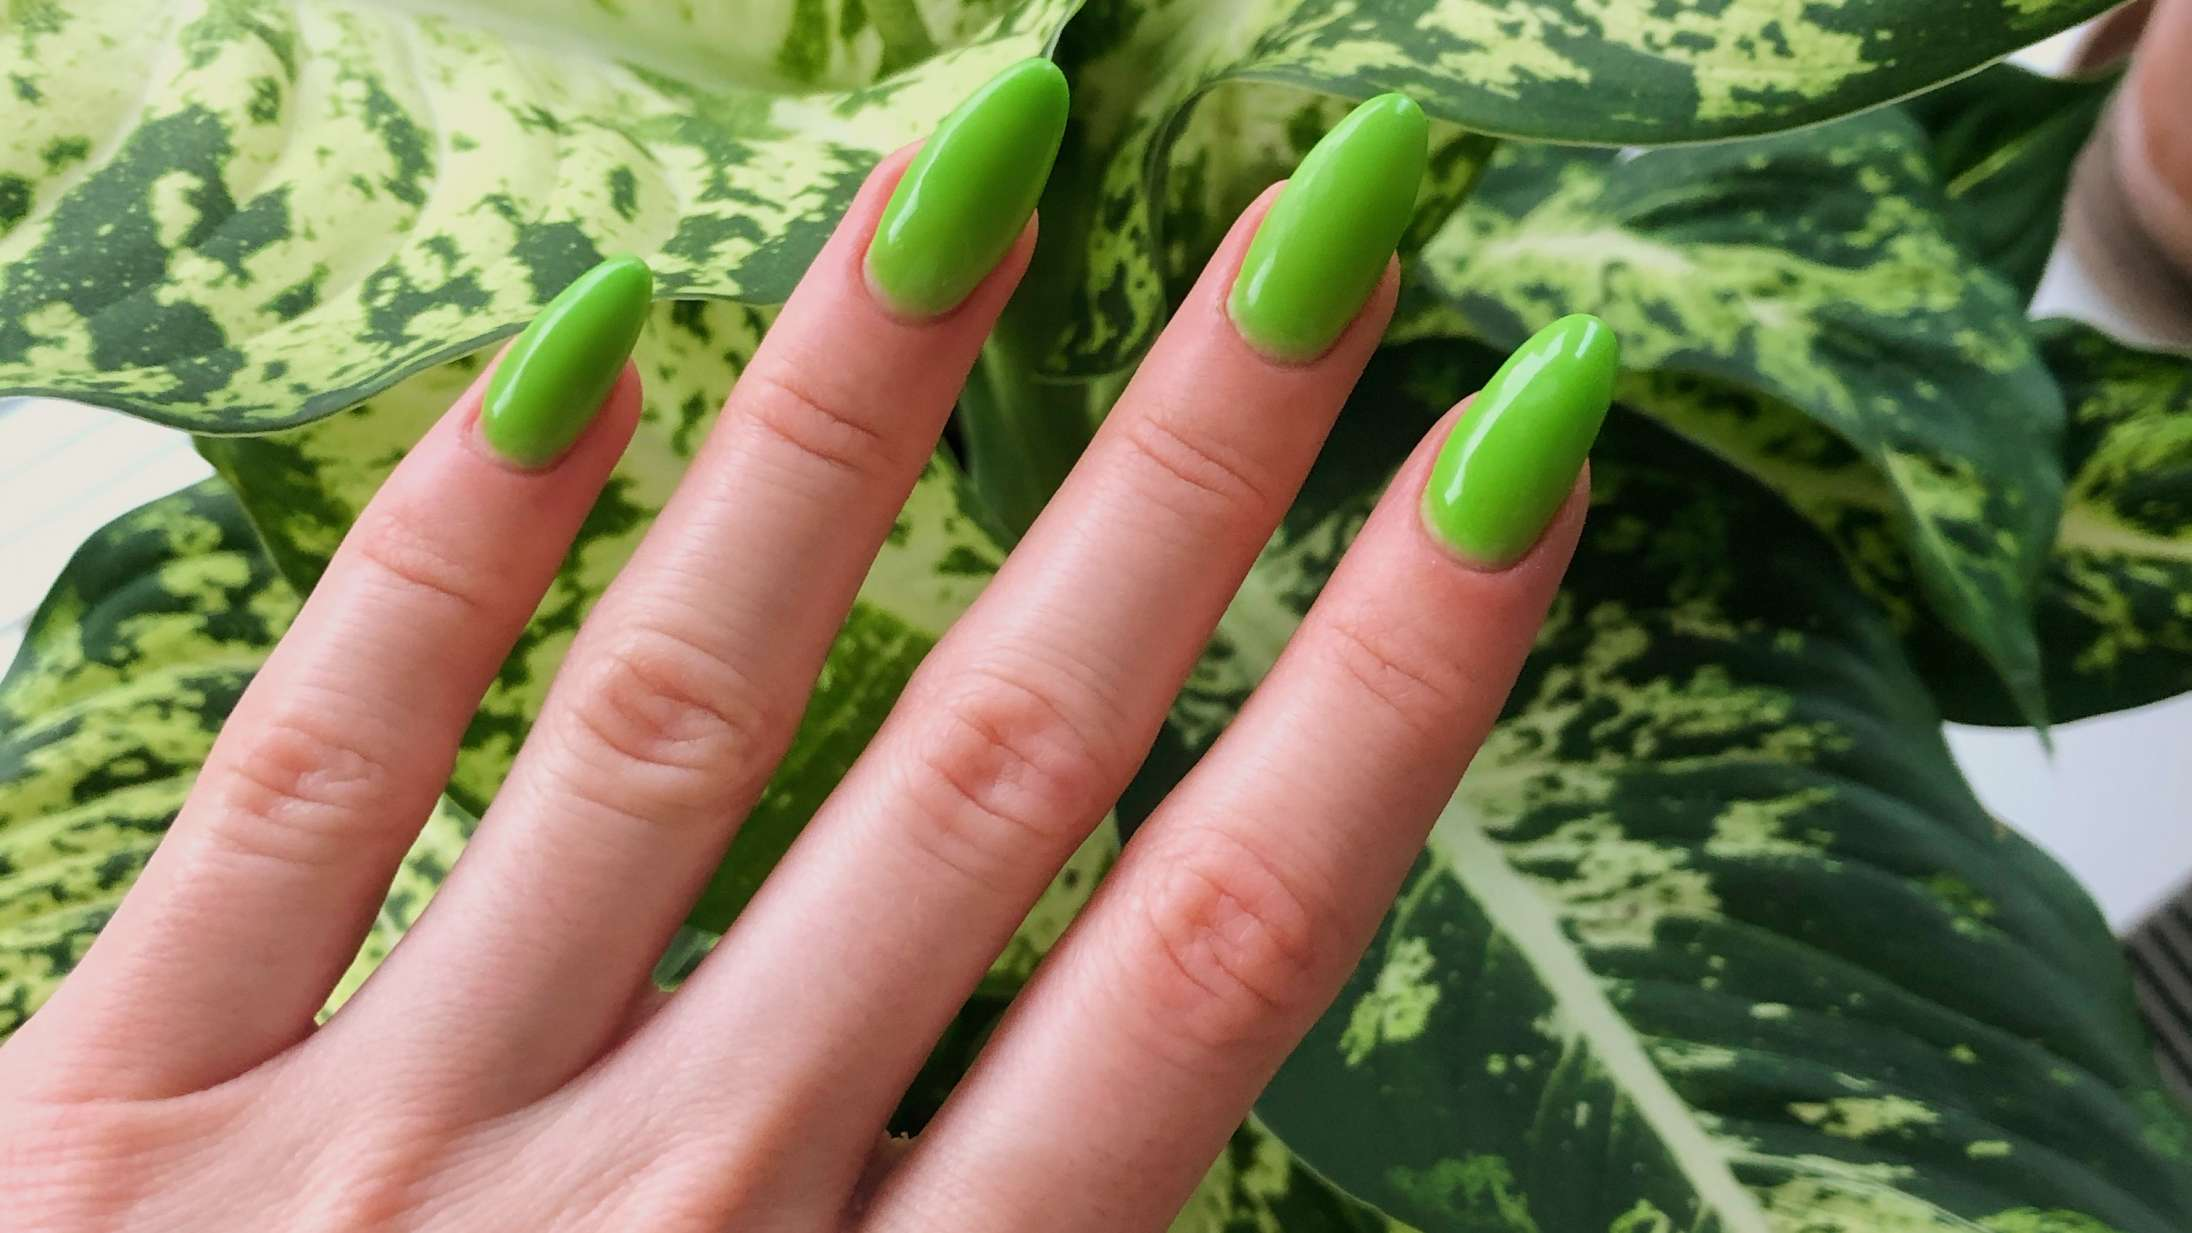 Kunstige negle: Ida Laurberg anbefaler inspirerende instagram-profiler